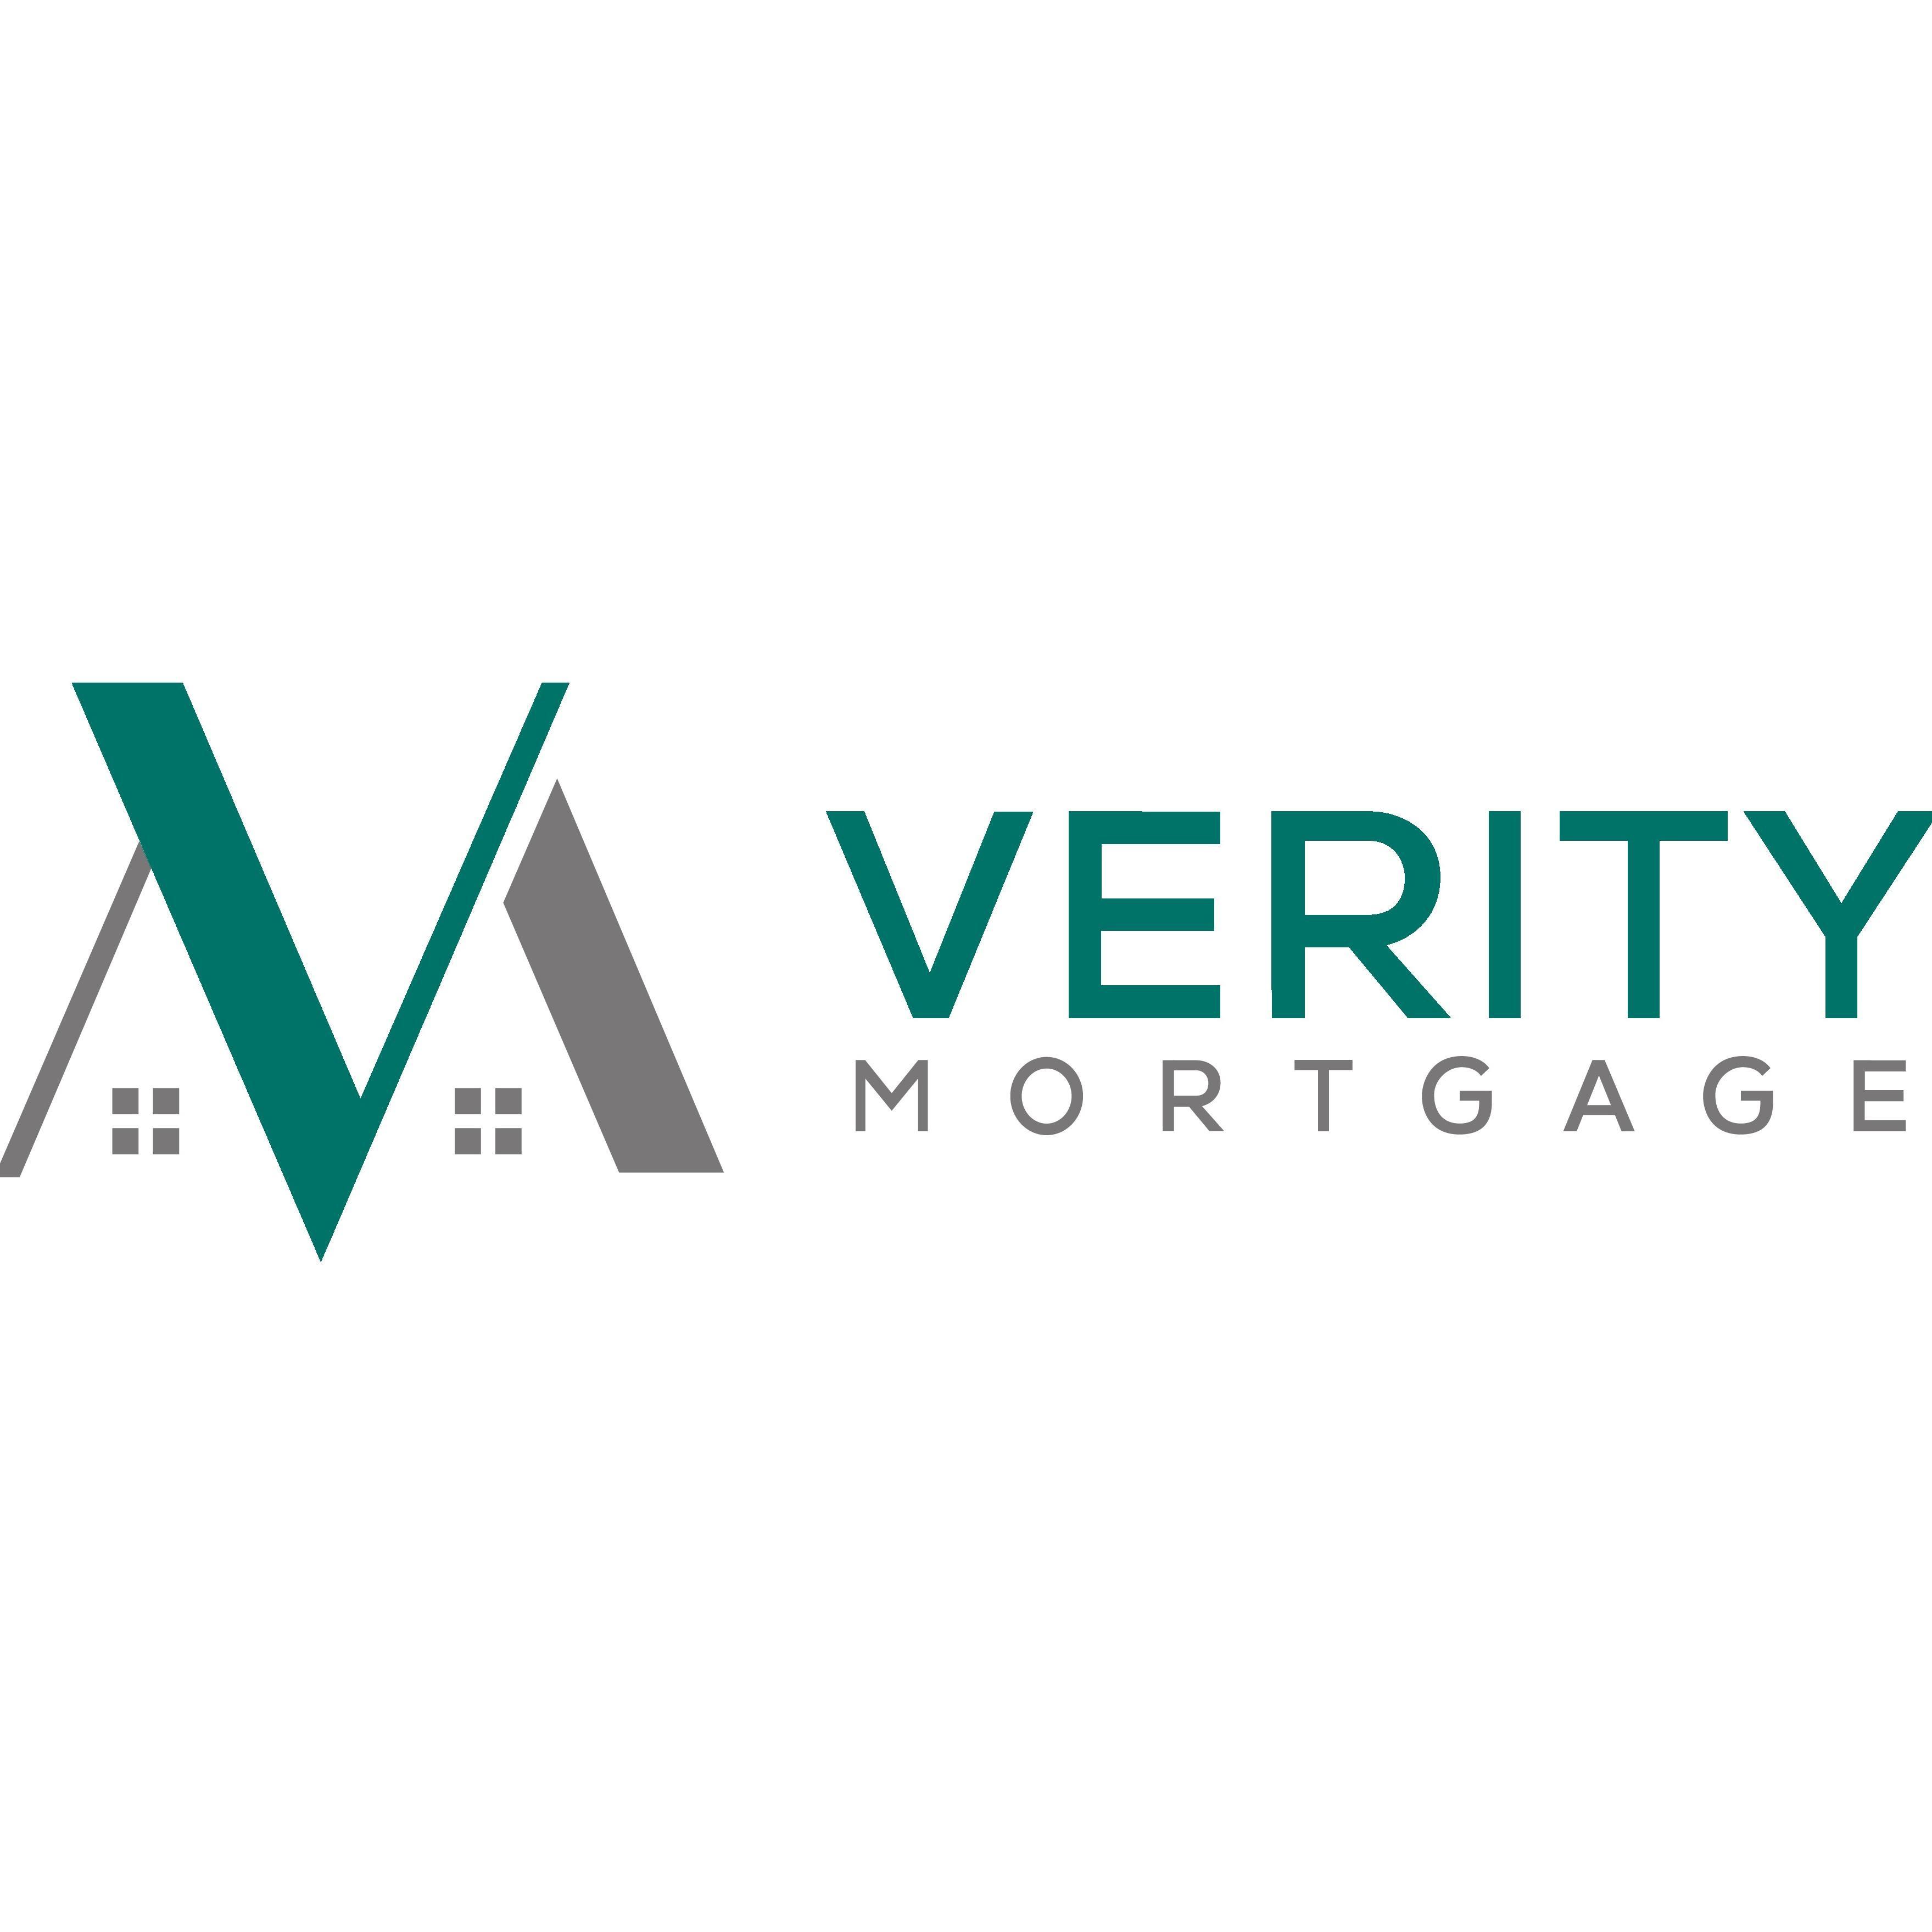 Verity Mortgage